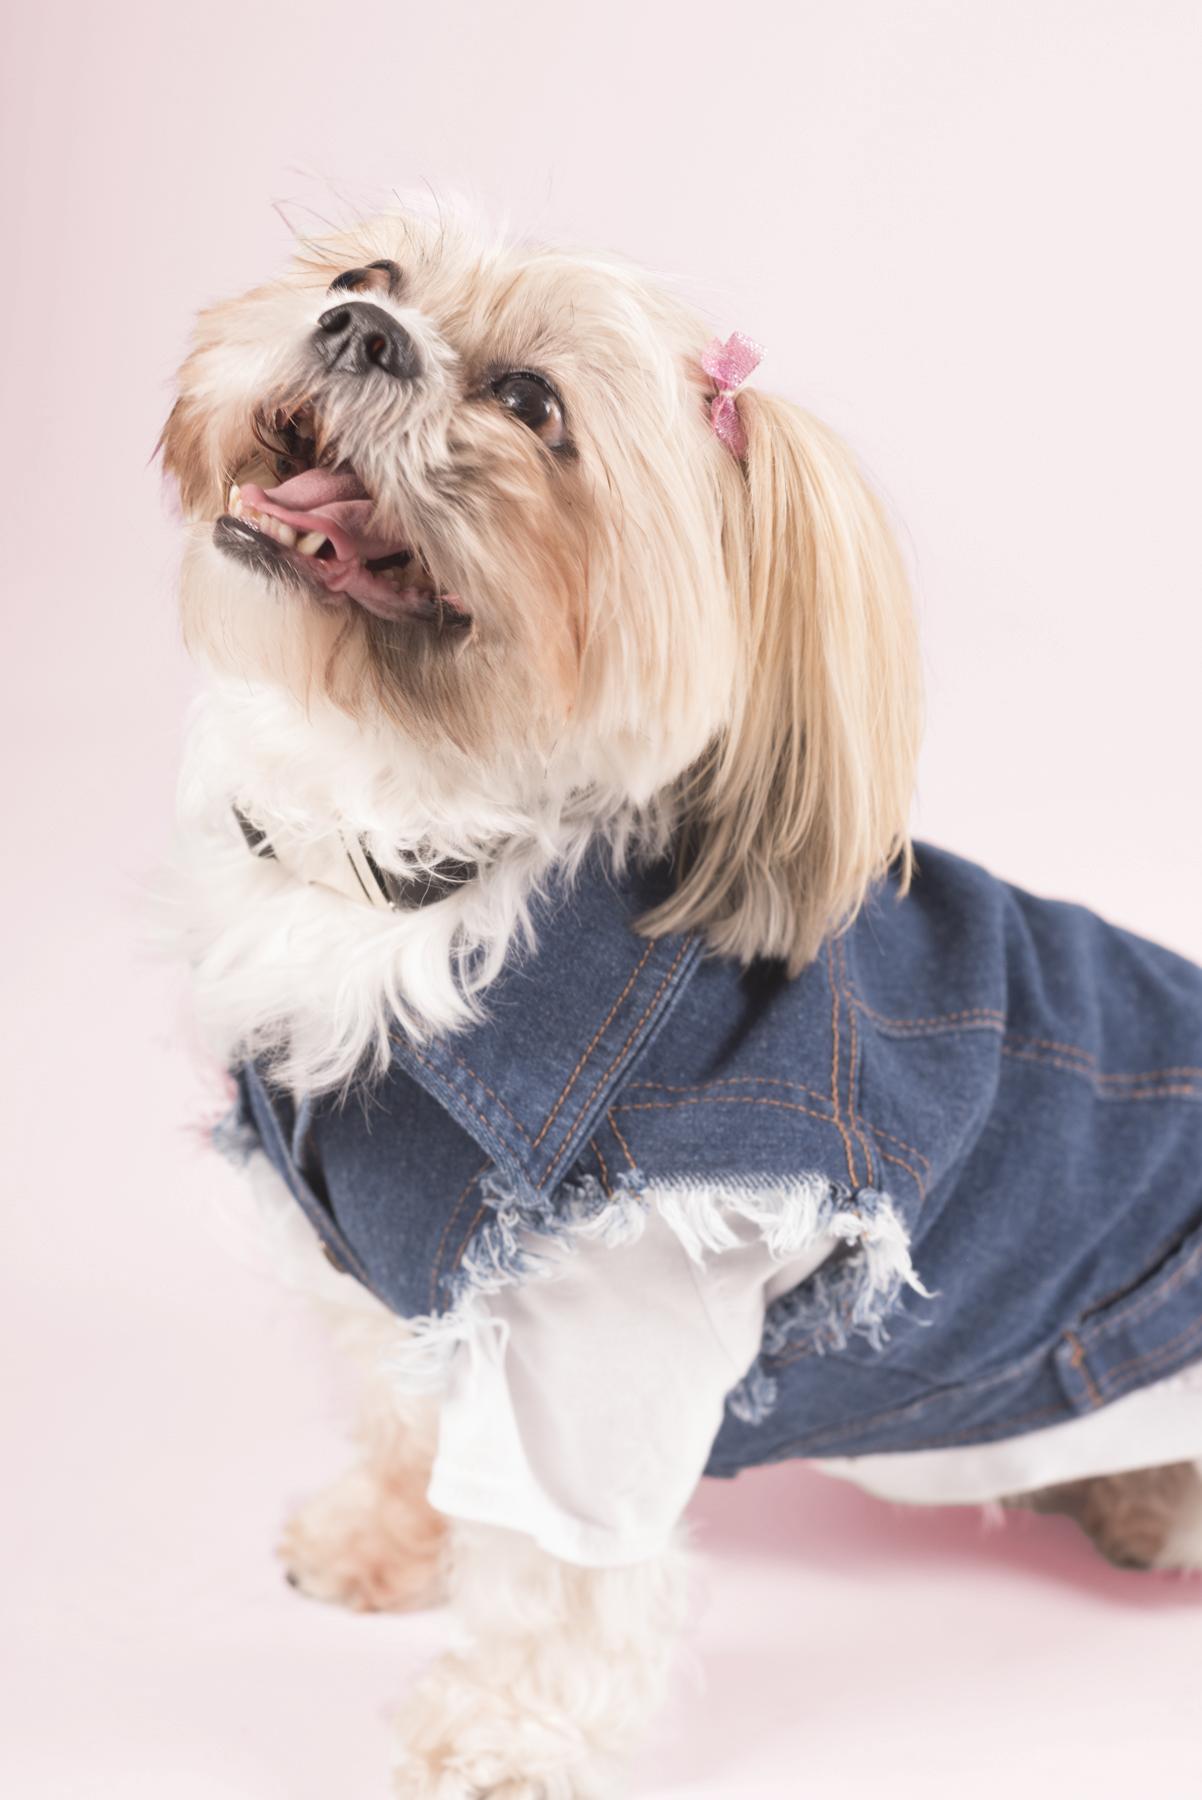 Meet Hazel. - Age: 7 years Breed: Shih-TzuHometown: Toronto, ON